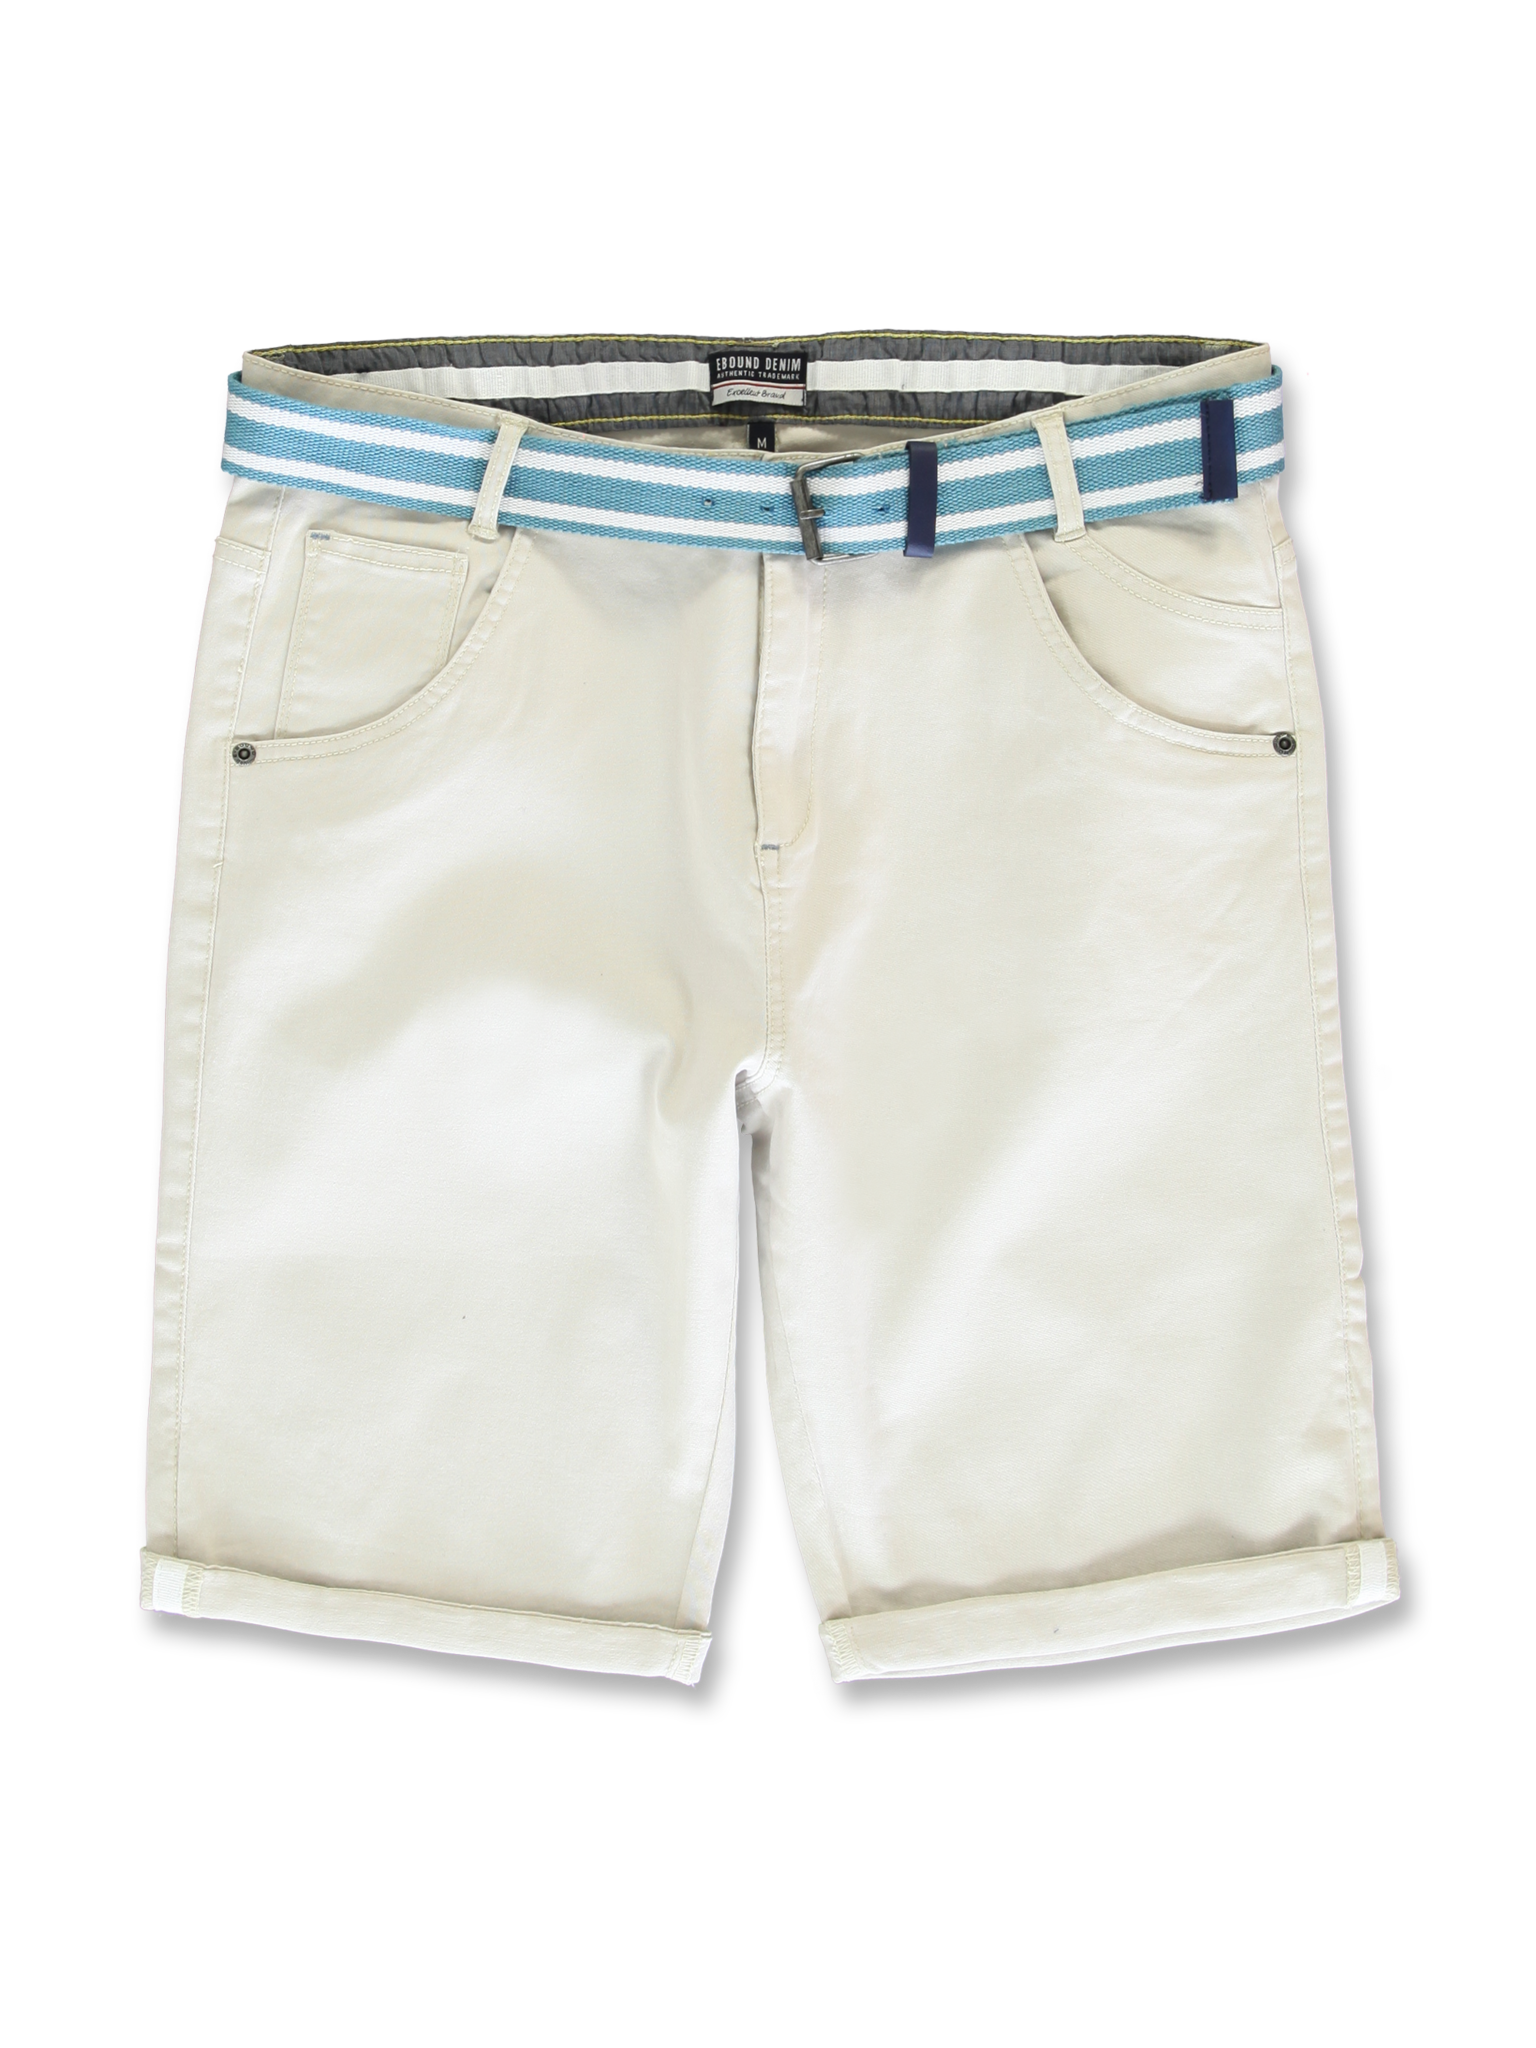 Ebound | Summer 2020 Men | Bermuda | 24 pcs/box